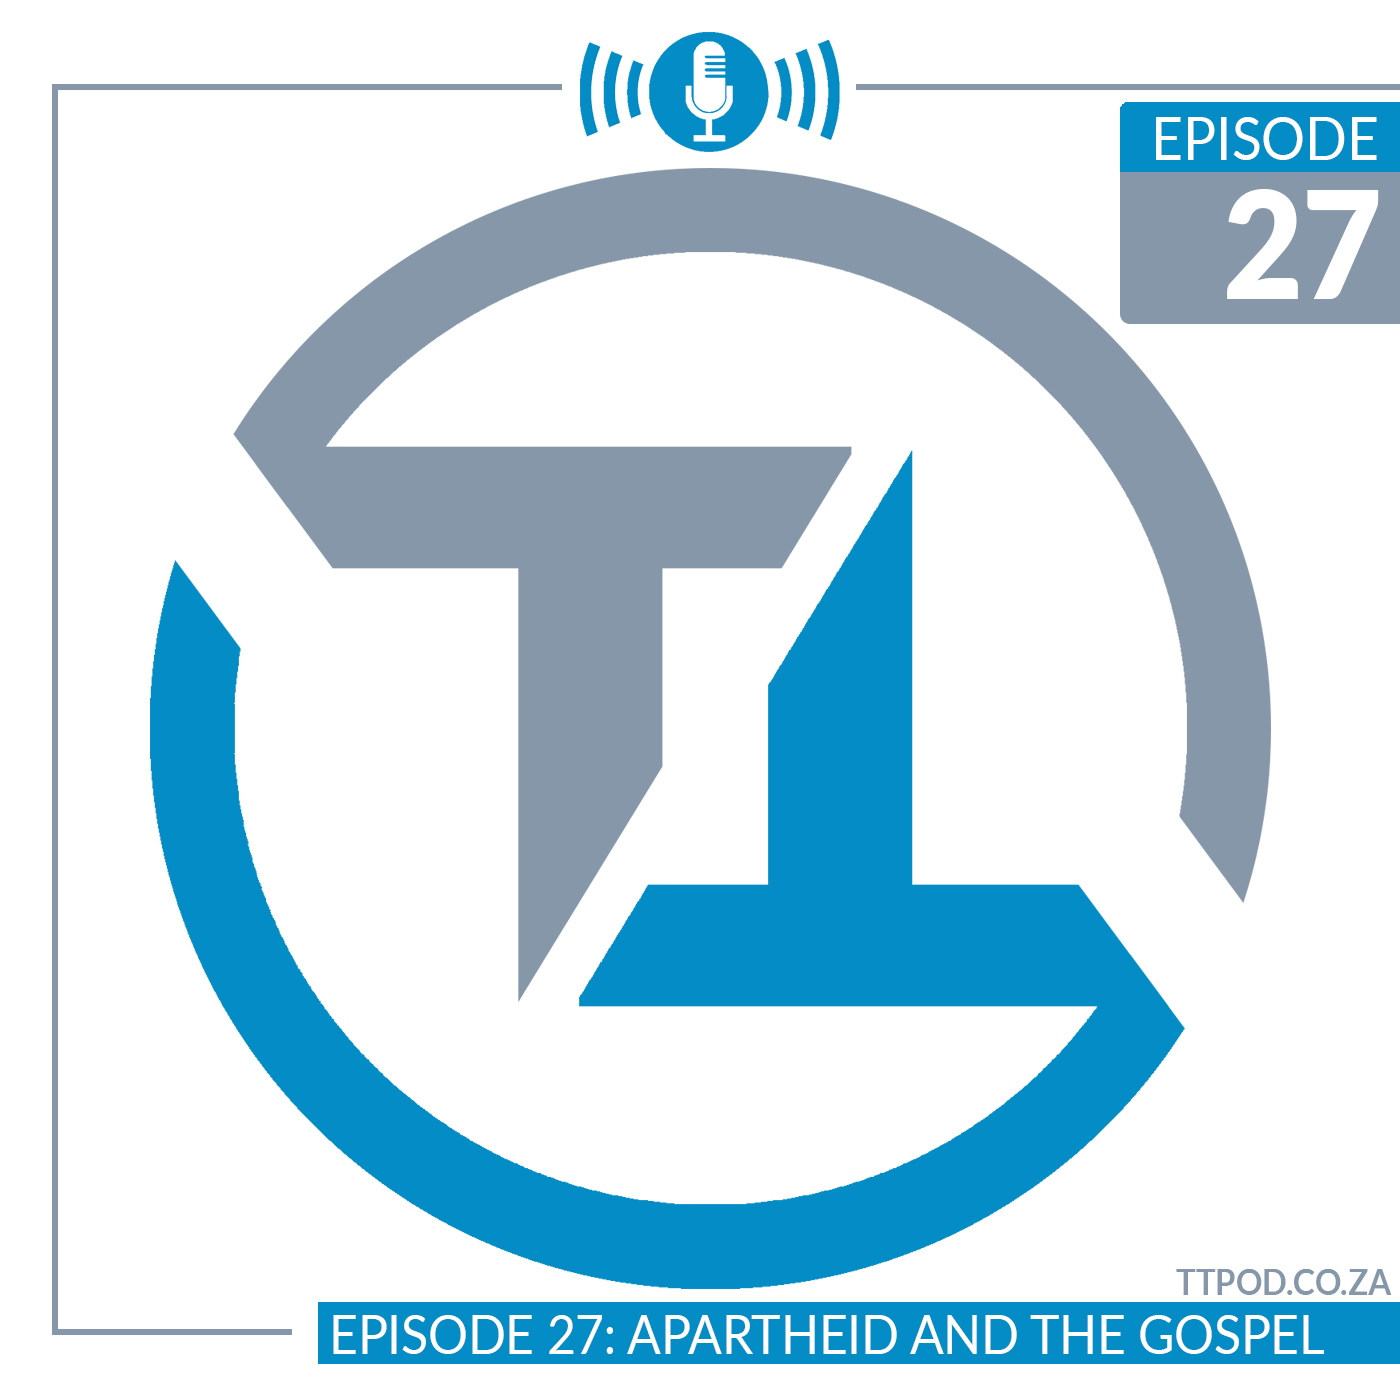 Episode 27: Apartheid and the Gospel